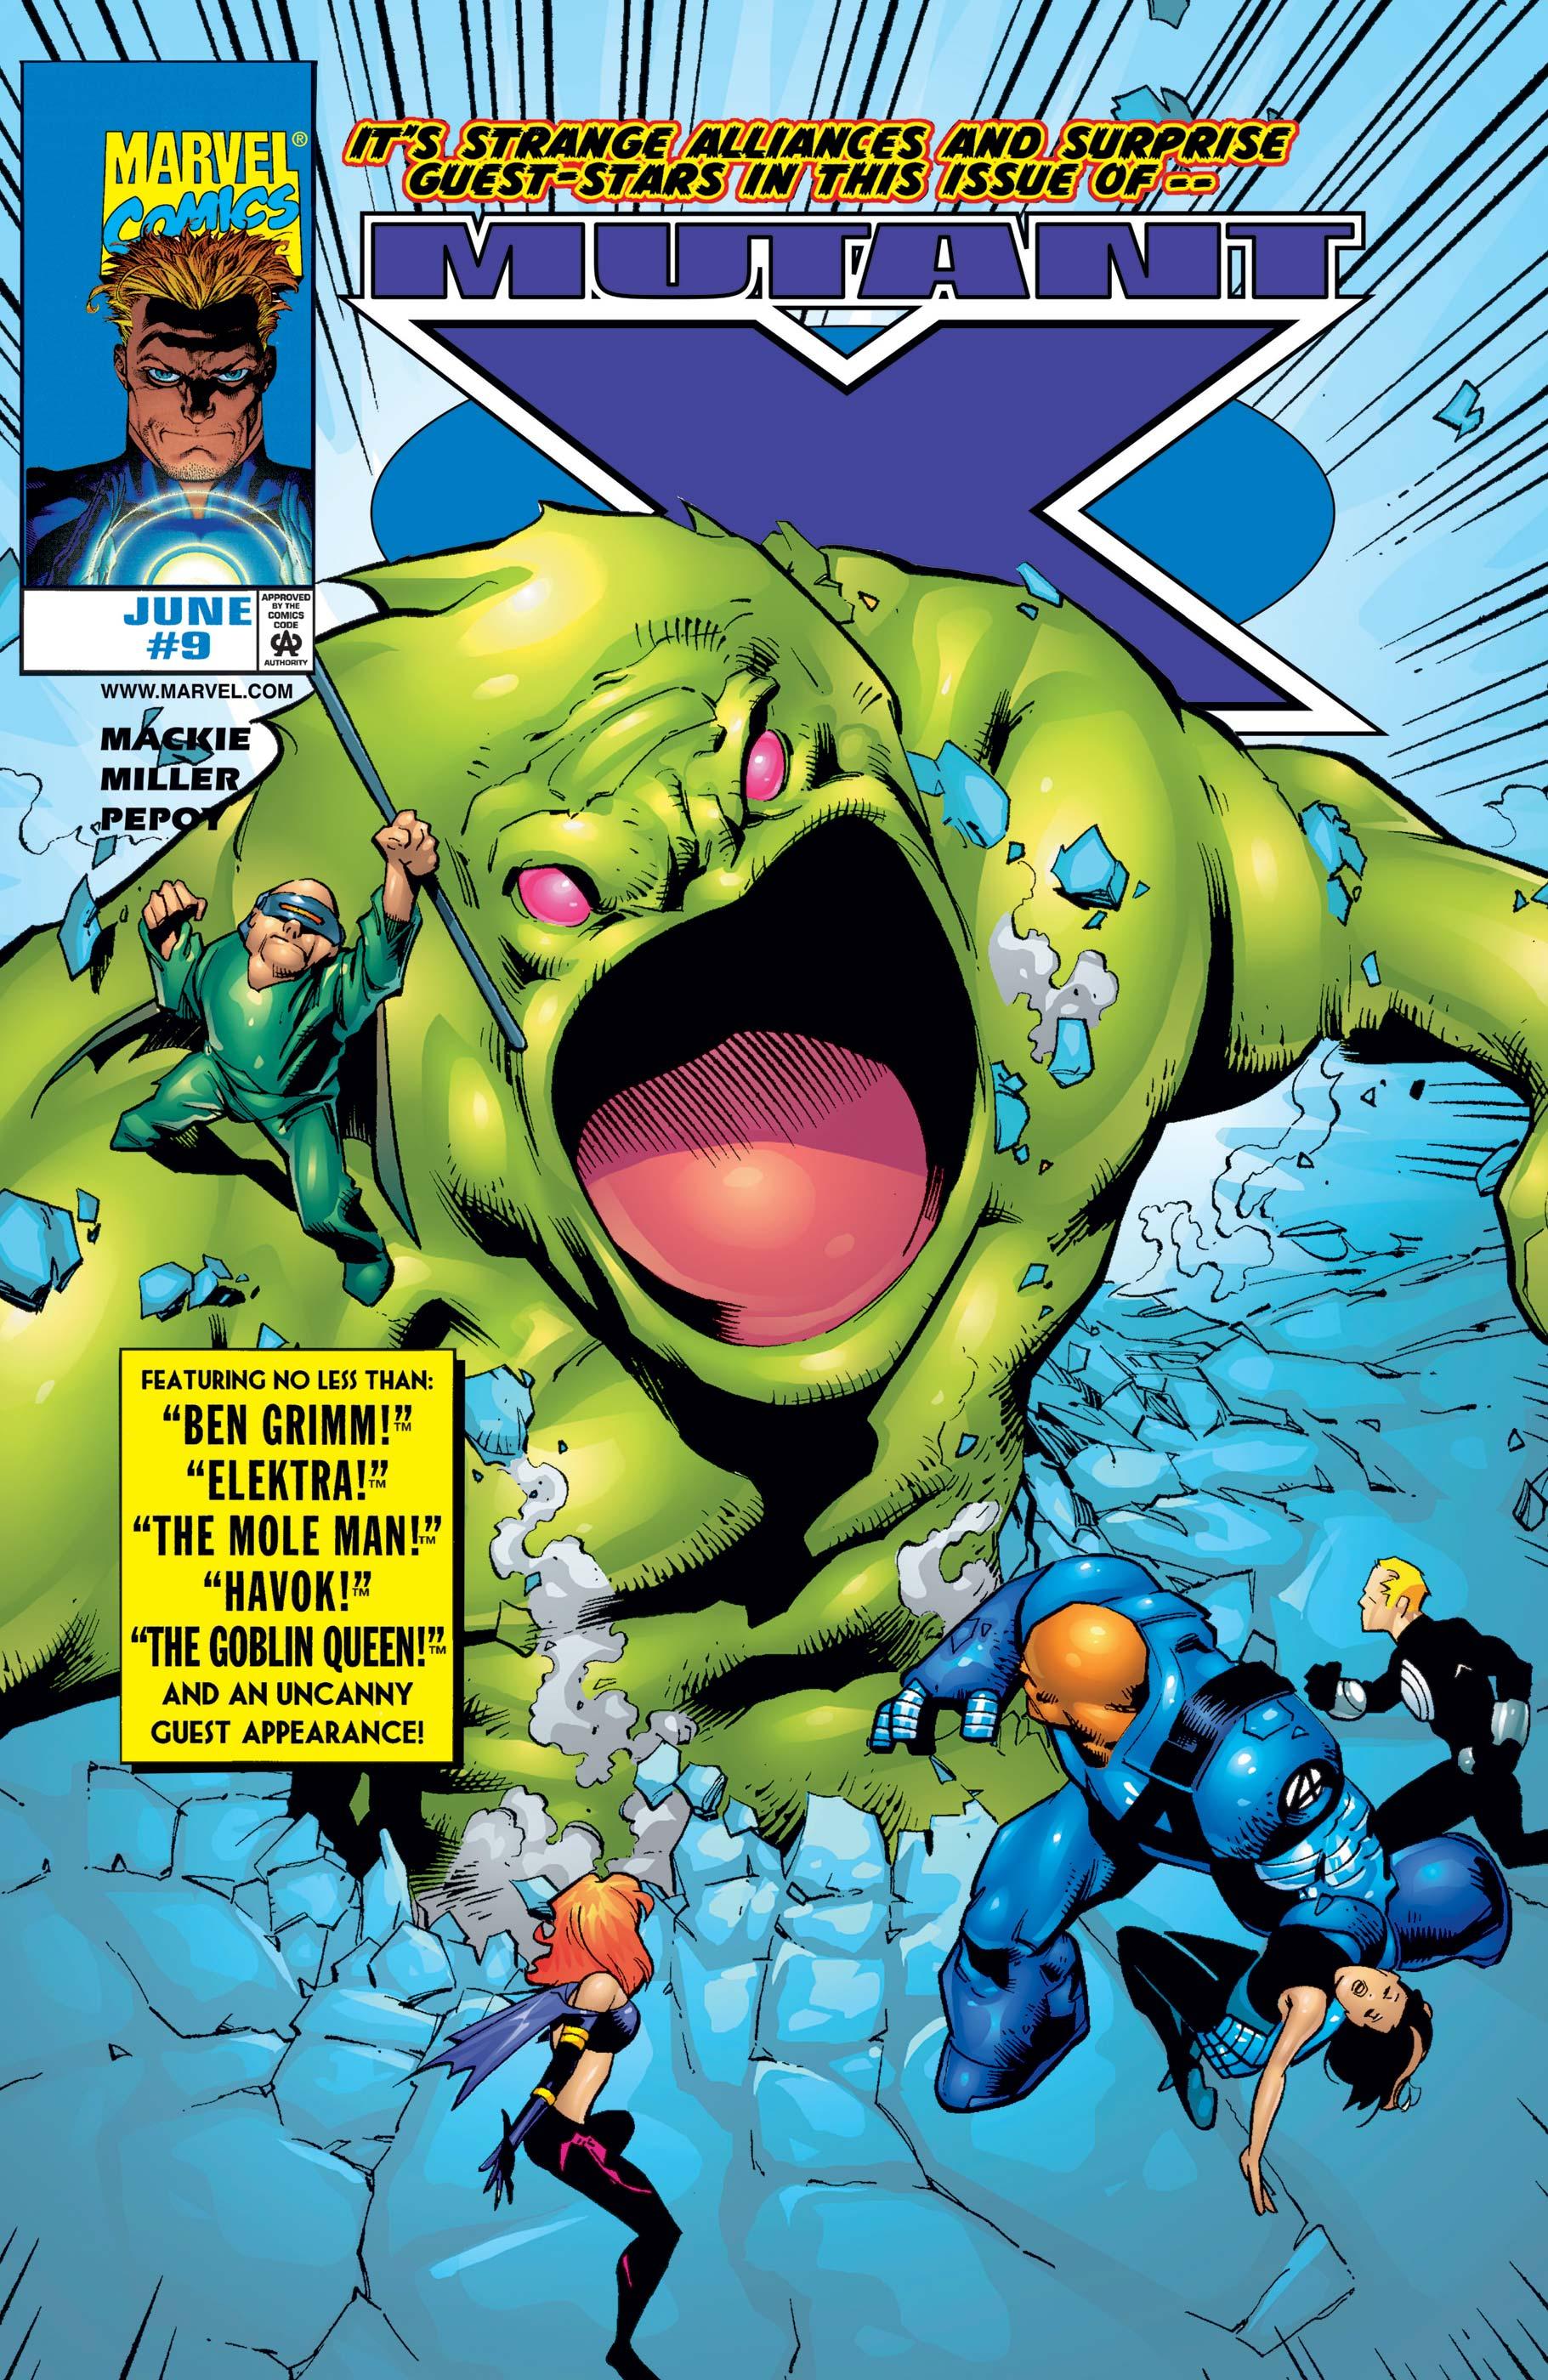 Mutant X (1998) #9